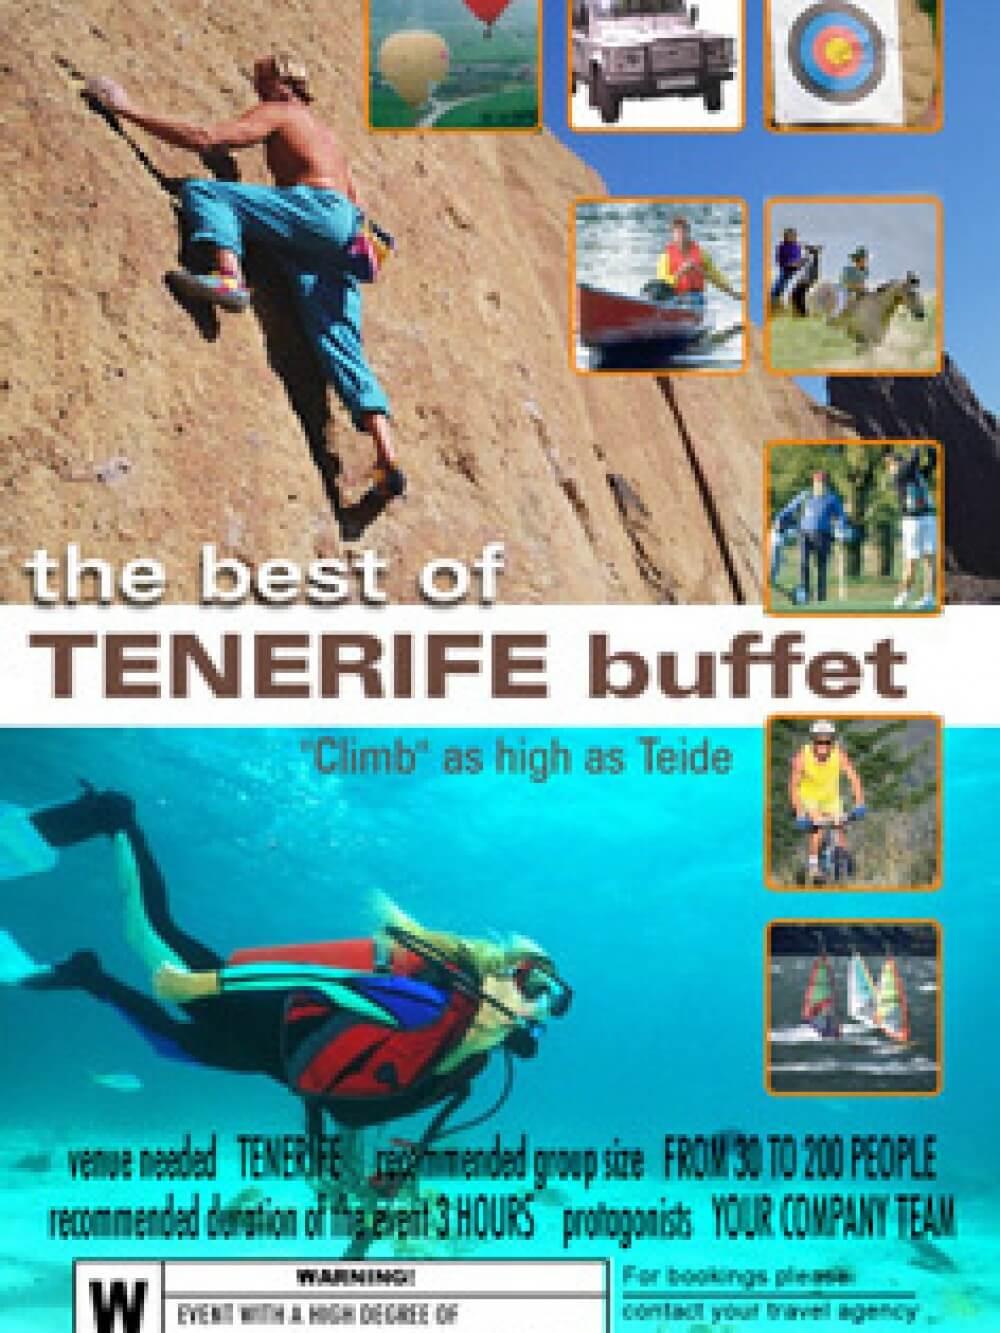 the_best_of_tenerife_buffet_vertical_web